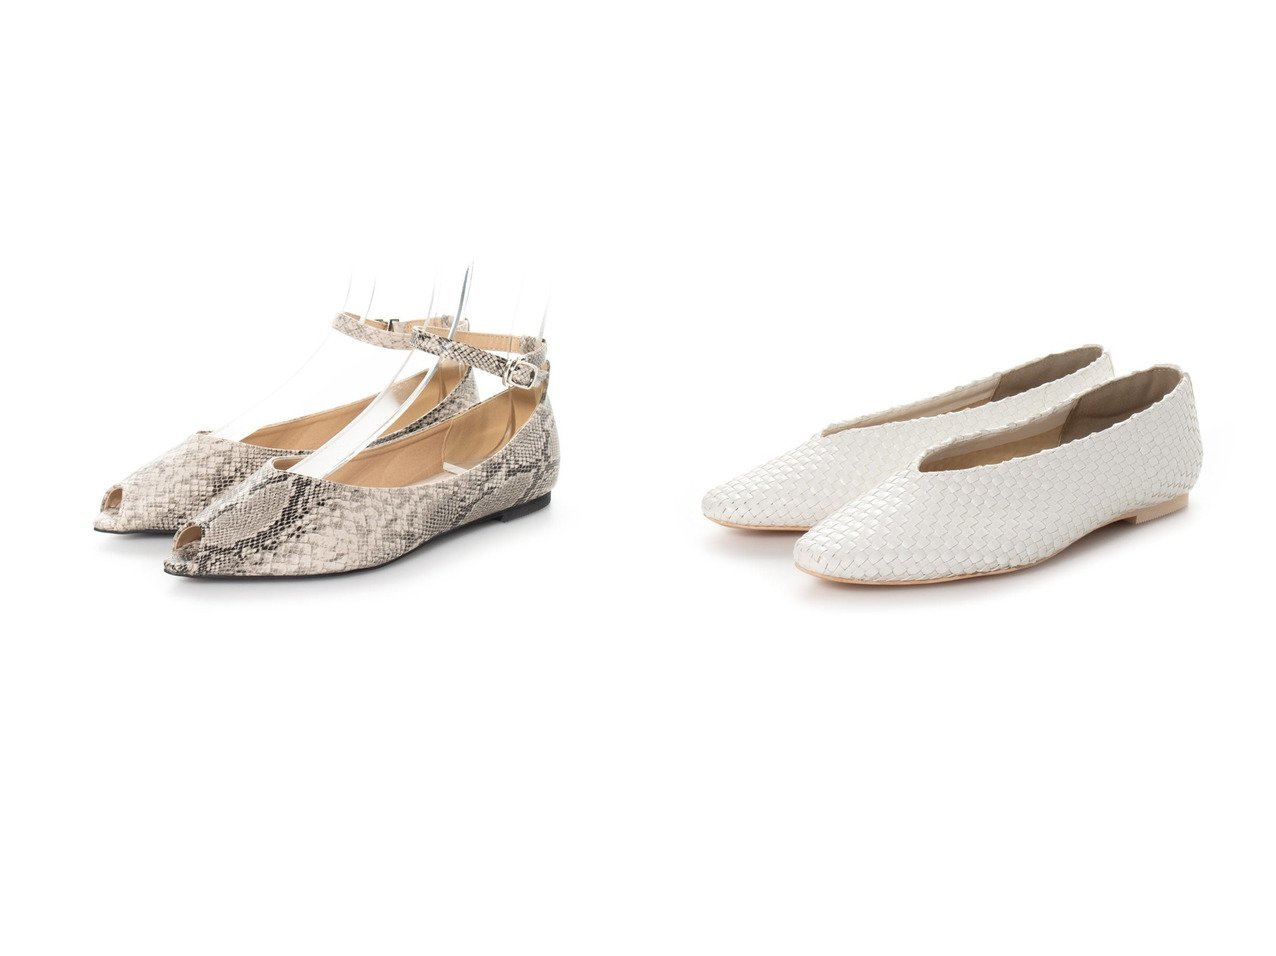 【RiiiKa/リーカ】のオープントゥネックベルトパンプス&スクエアトゥメッシュパンプス シューズ・靴のおすすめ!人気、トレンド・レディースファッションの通販  おすすめで人気の流行・トレンド、ファッションの通販商品 メンズファッション・キッズファッション・インテリア・家具・レディースファッション・服の通販 founy(ファニー) https://founy.com/ ファッション Fashion レディースファッション WOMEN ベルト Belts 2021年 2021 2021 春夏 S/S SS Spring/Summer 2021 S/S 春夏 SS Spring/Summer クッション デニム ワイド 春 Spring |ID:crp329100000019301